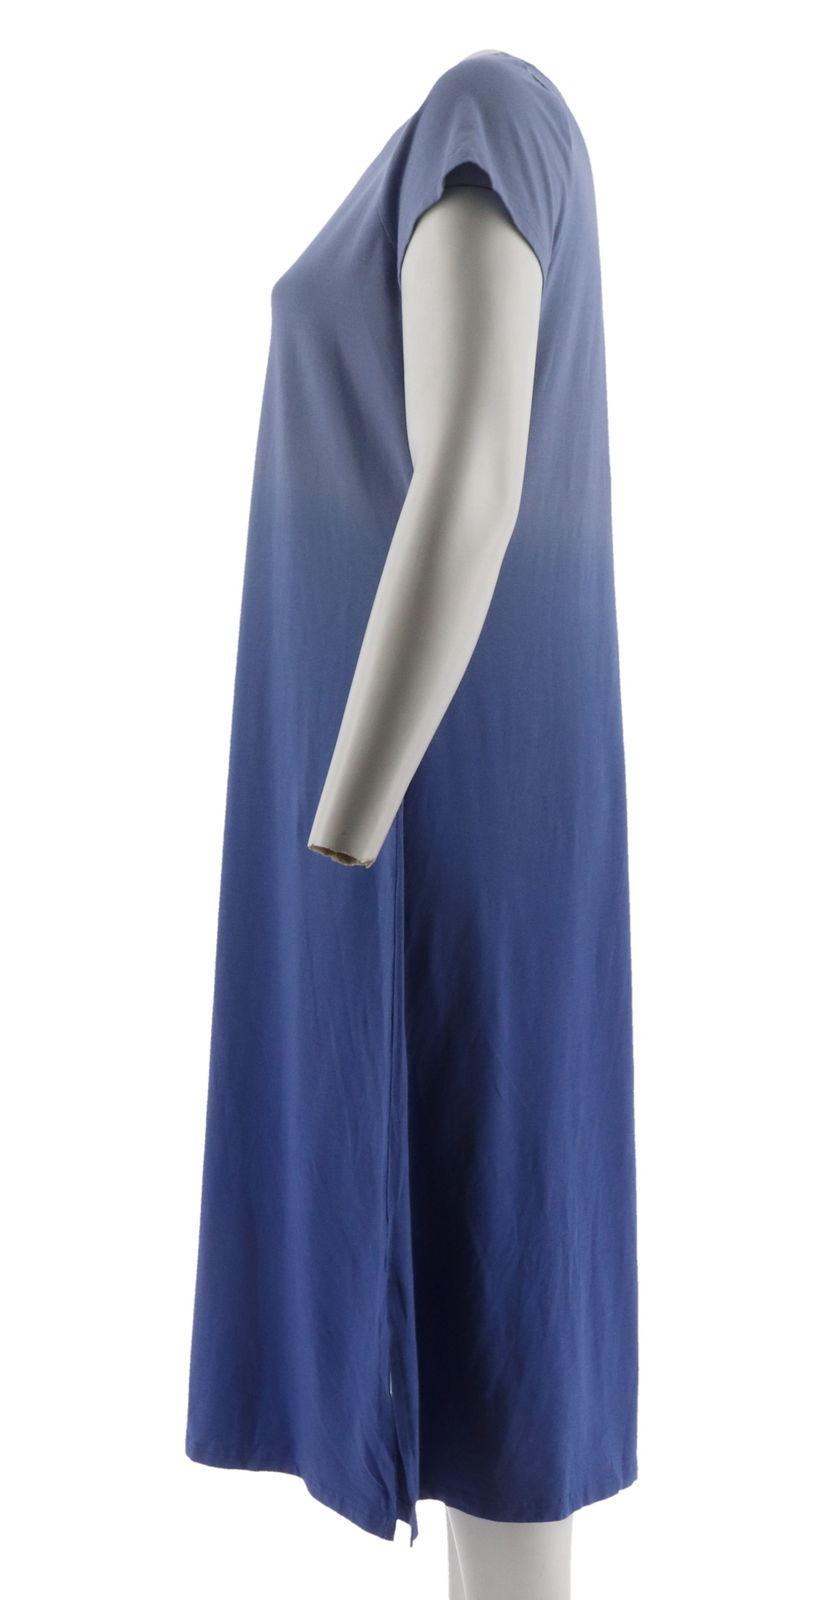 H Halston Short Slv Dip Dye Knit Midi Dress Purple Iris S NEW A289380 image 2